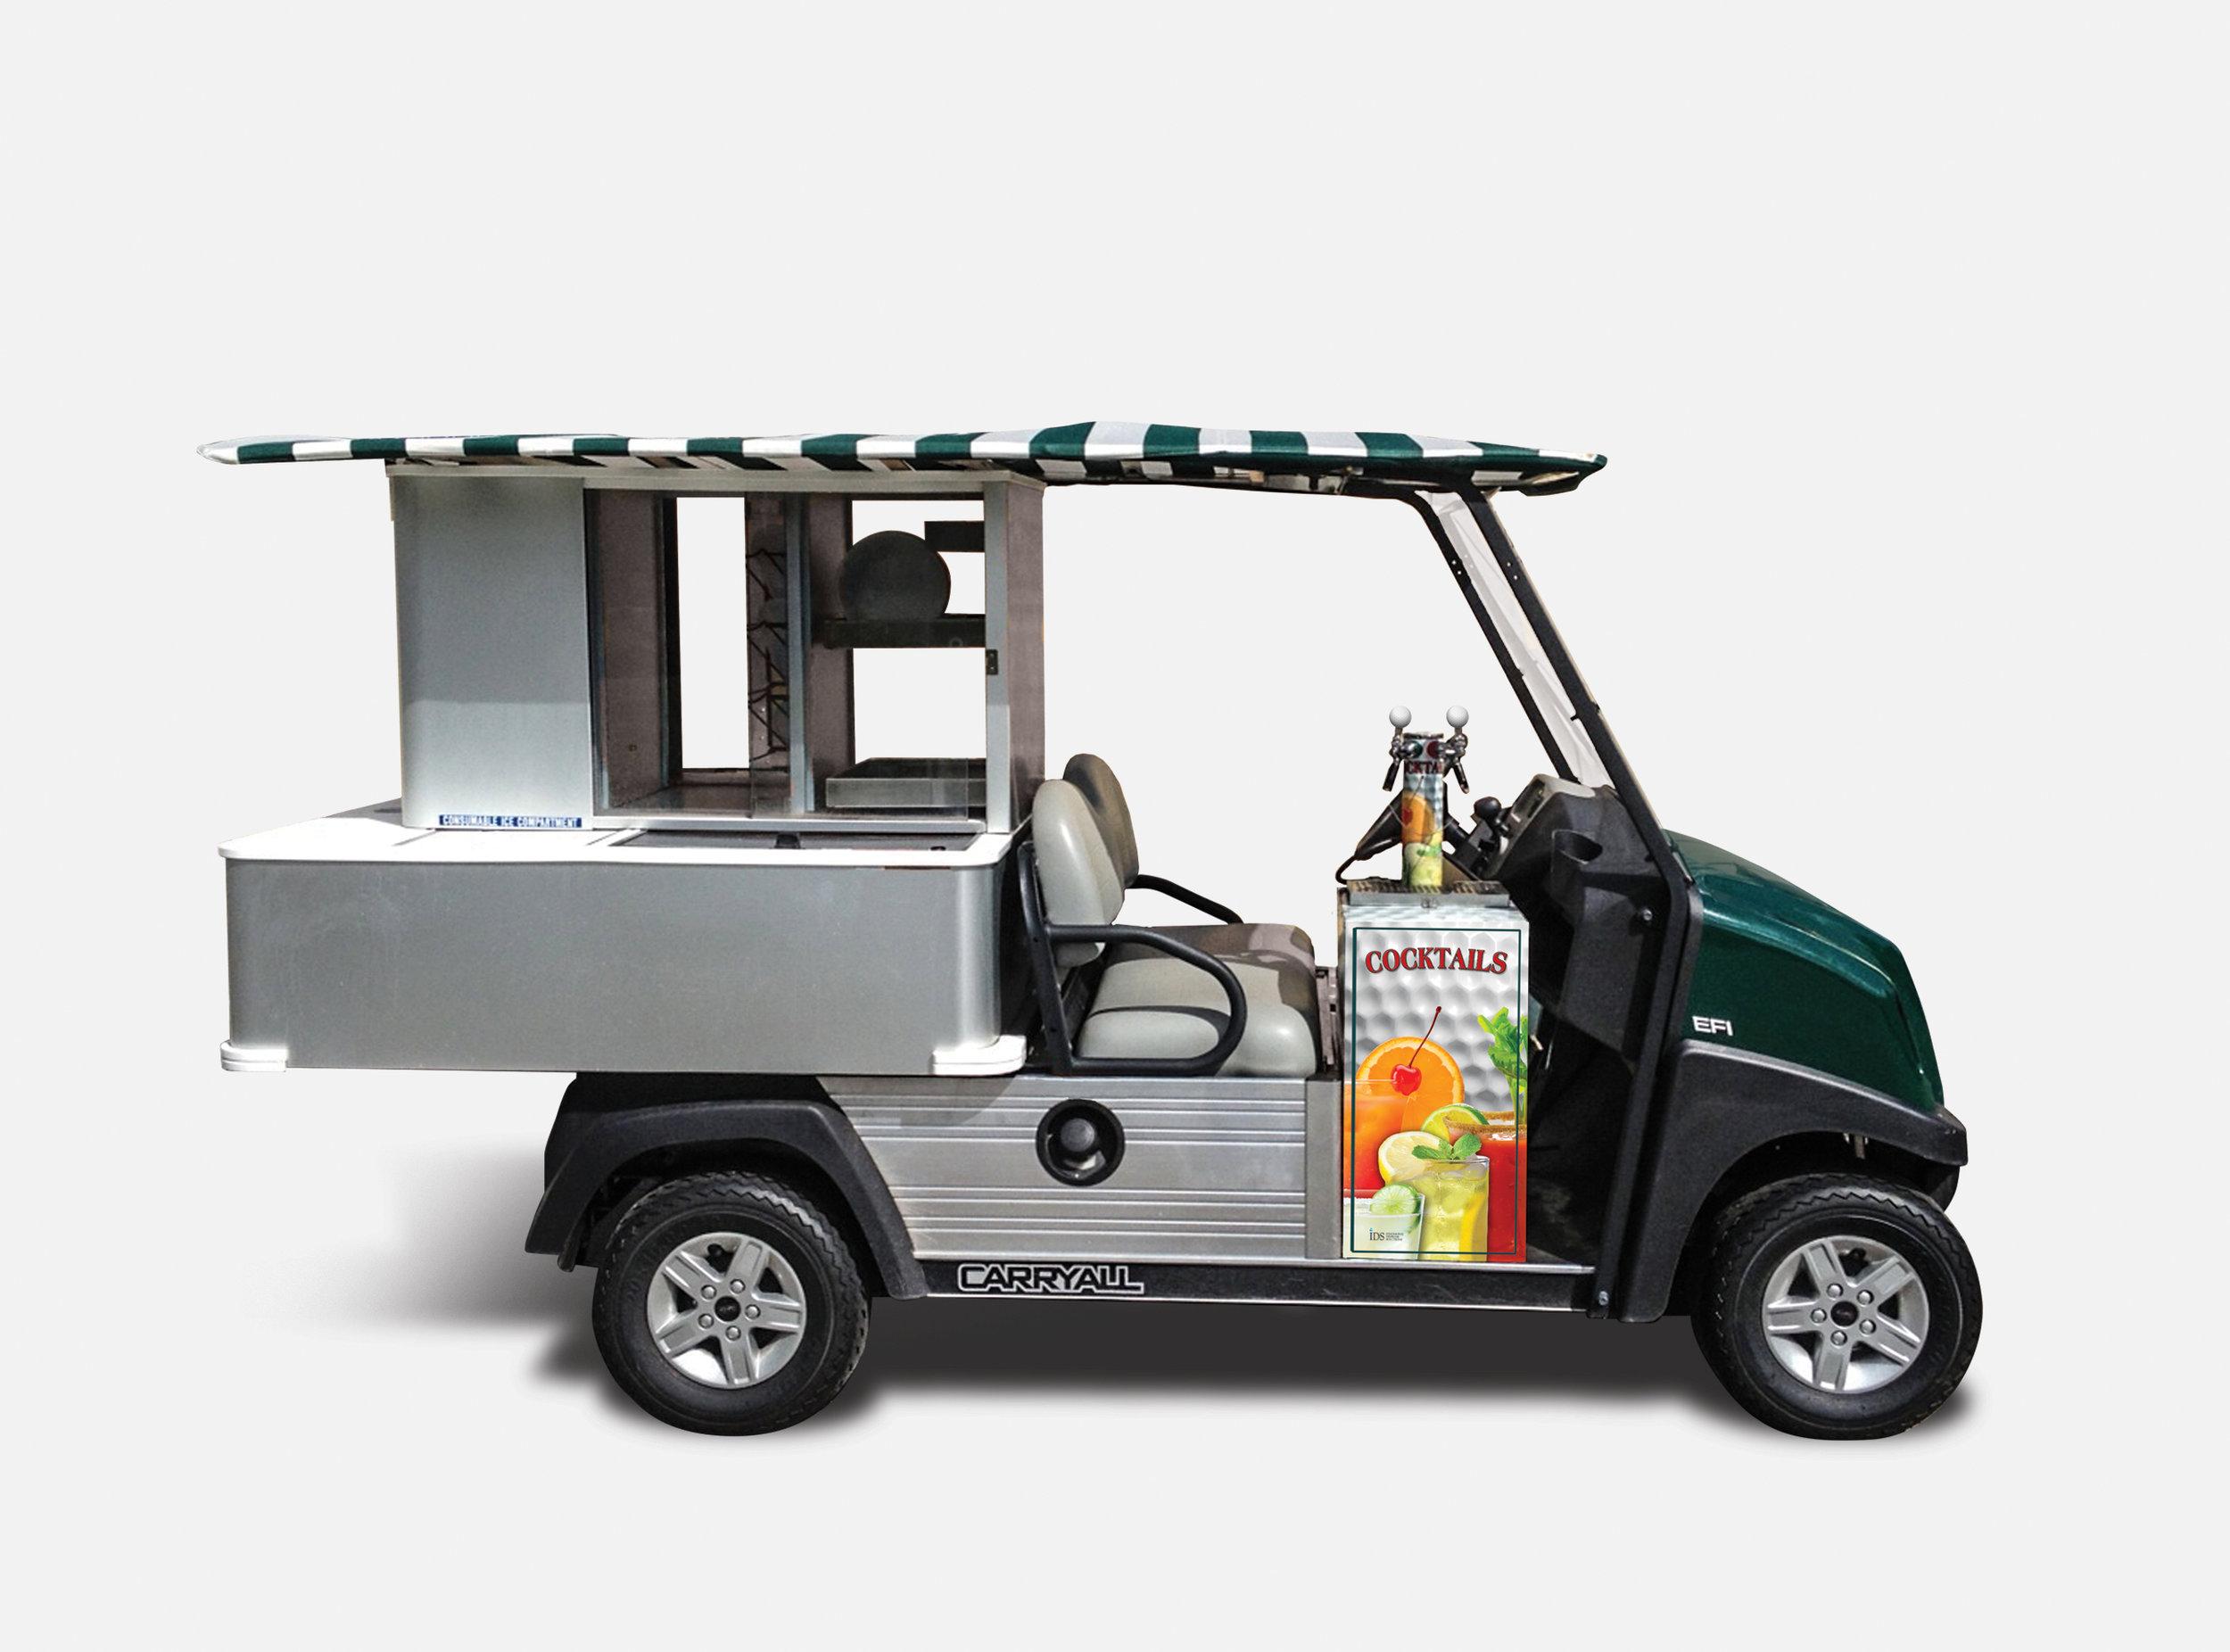 Golf-cart-on-course-+Tee-Box-2.jpg